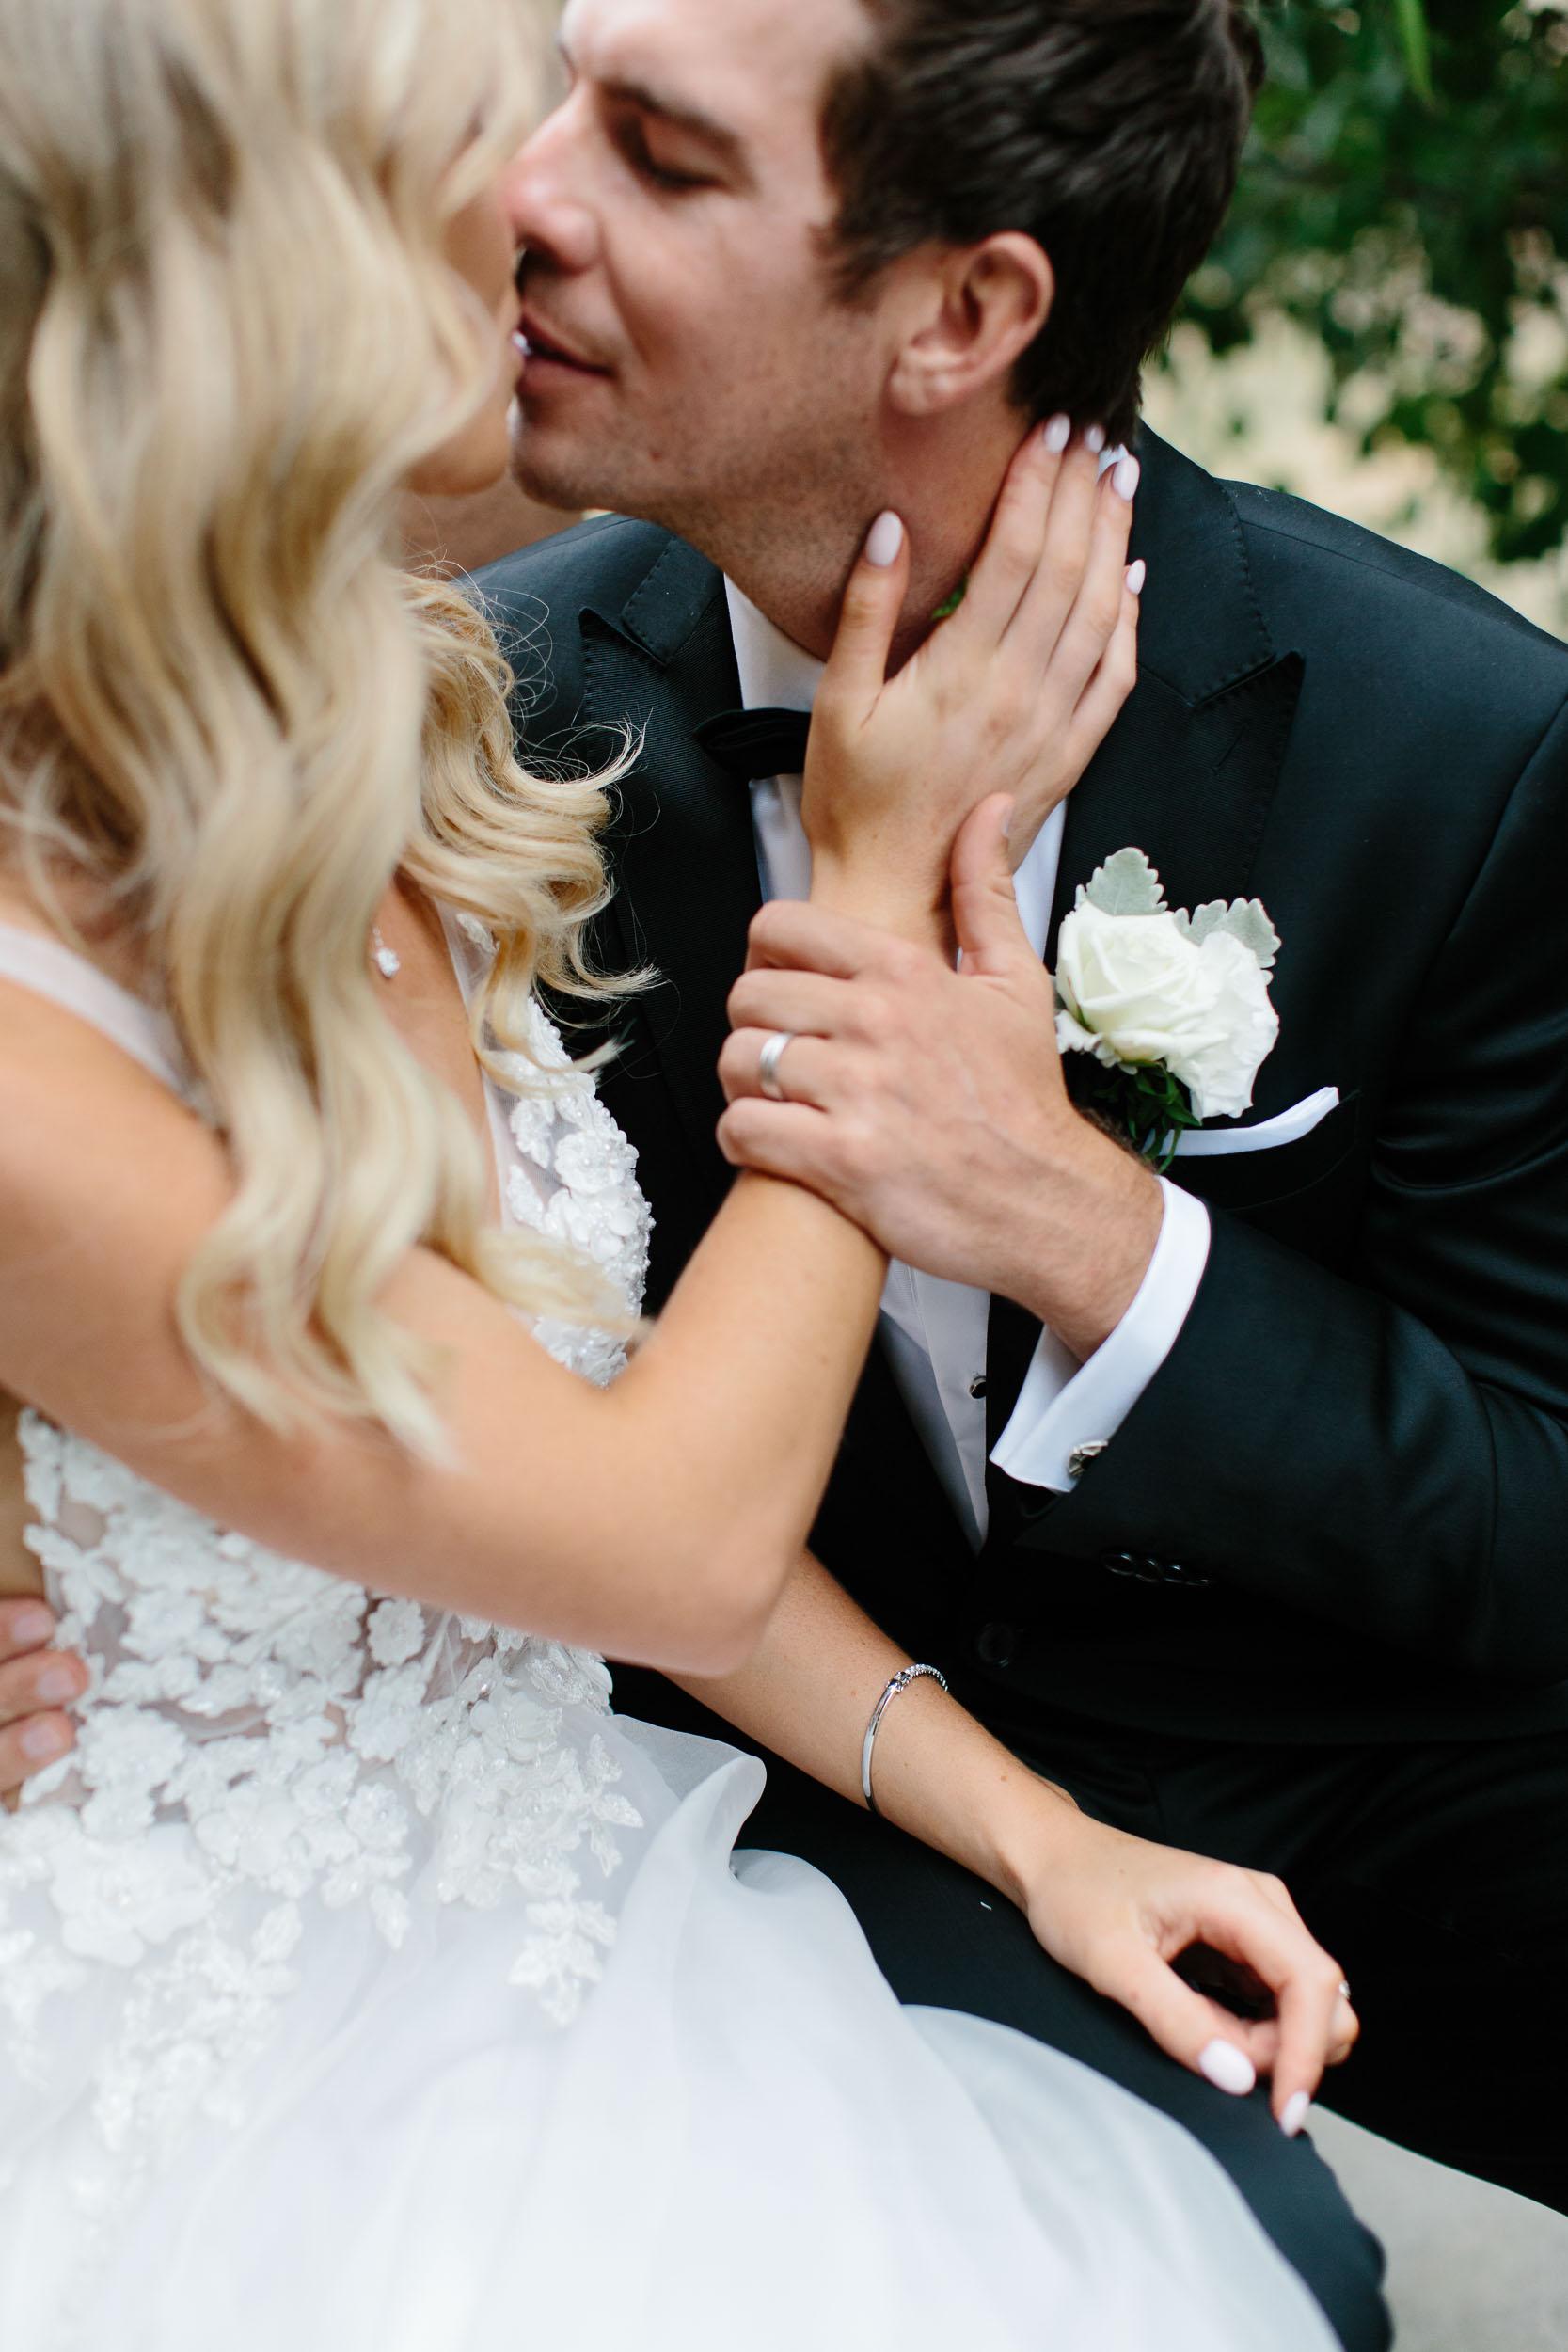 Kas-Richards-Mornington-Peninsula-Private-Property-Wedding-Marianna-Hardwick-Gown-432.jpg